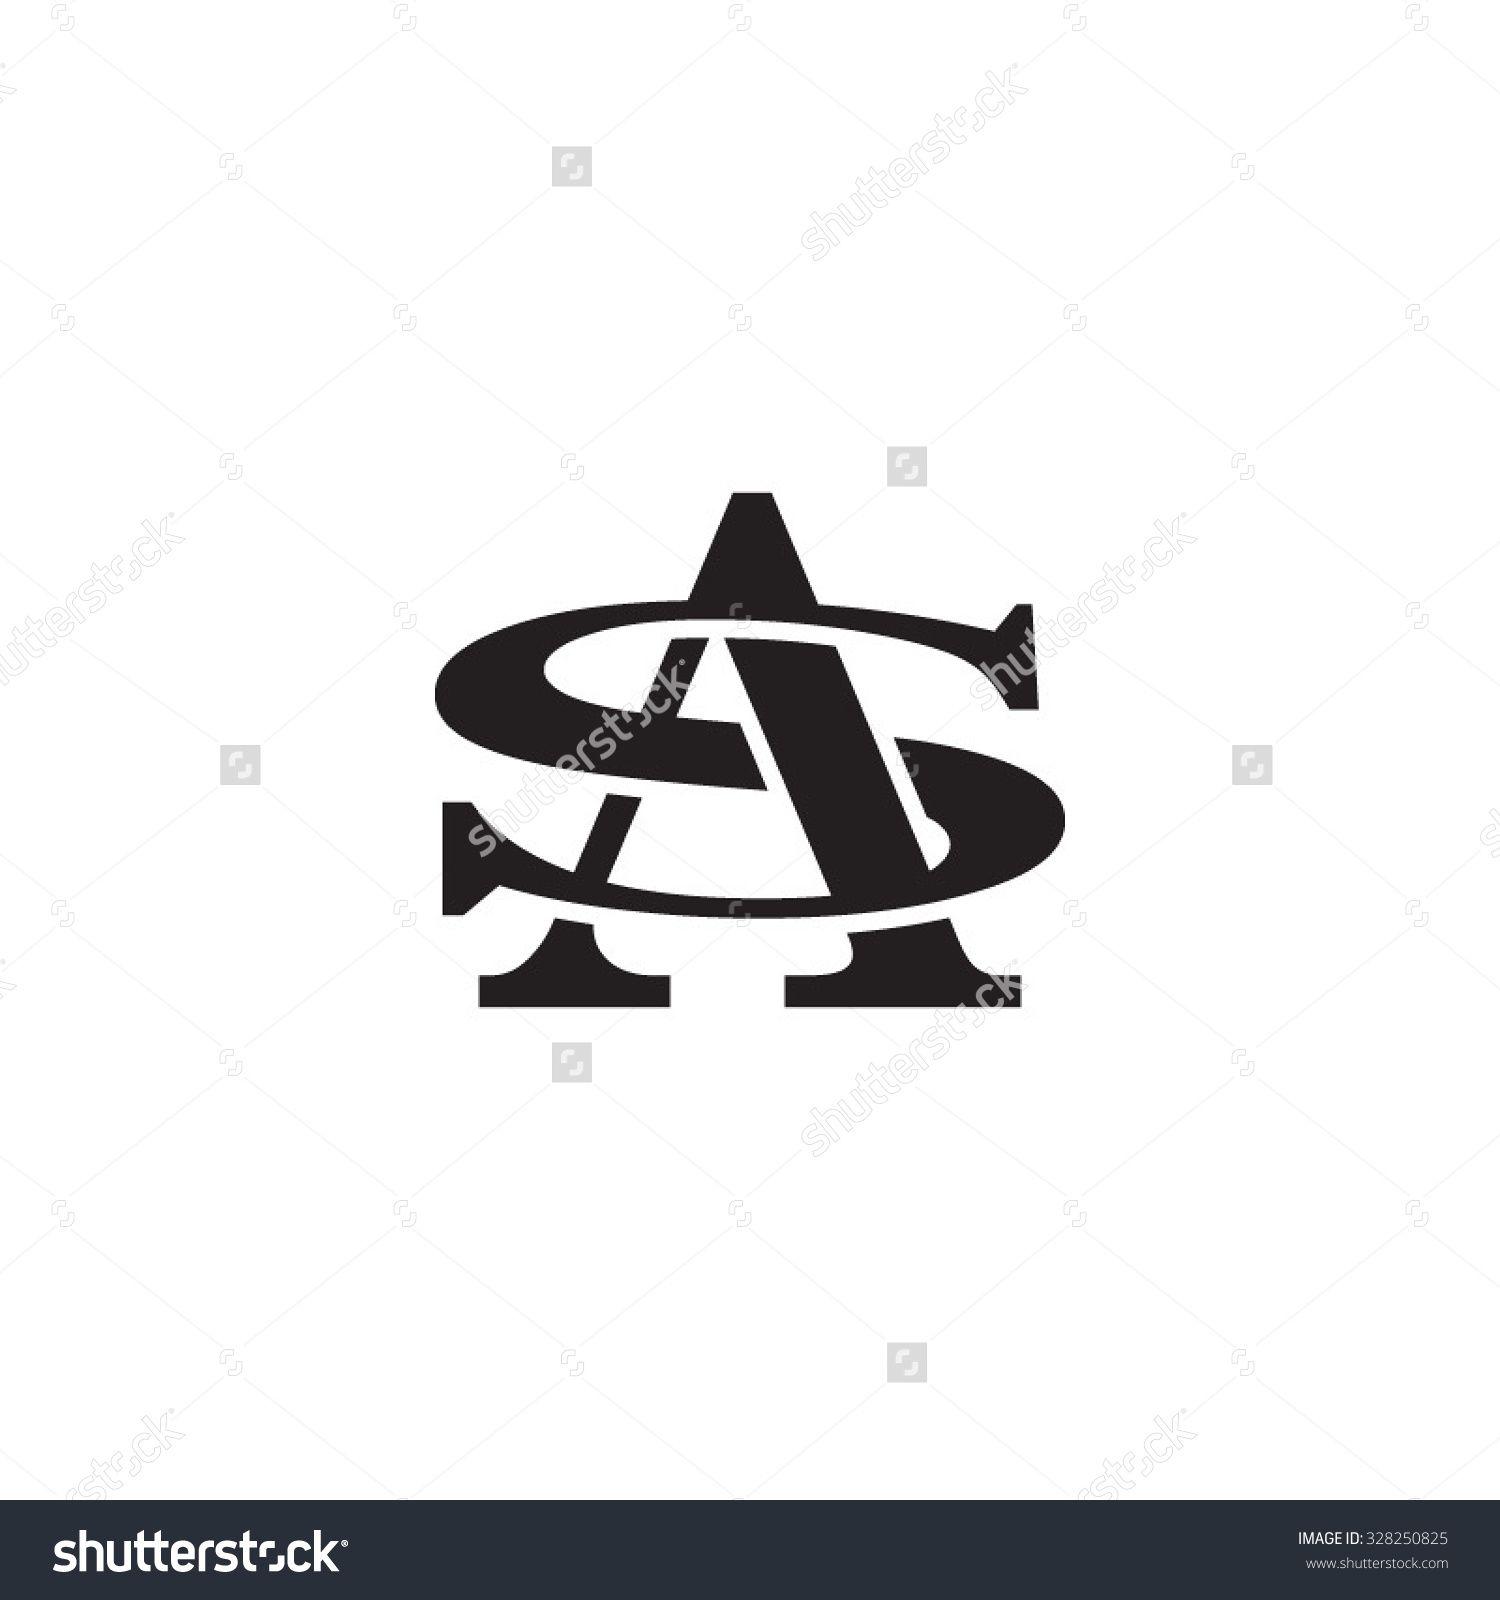 Tj initial luxury ornament monogram logo stock vector - Pin By Nella Millo On Monogramm As Sa Pinterest Logos Personal Logo And Monograms